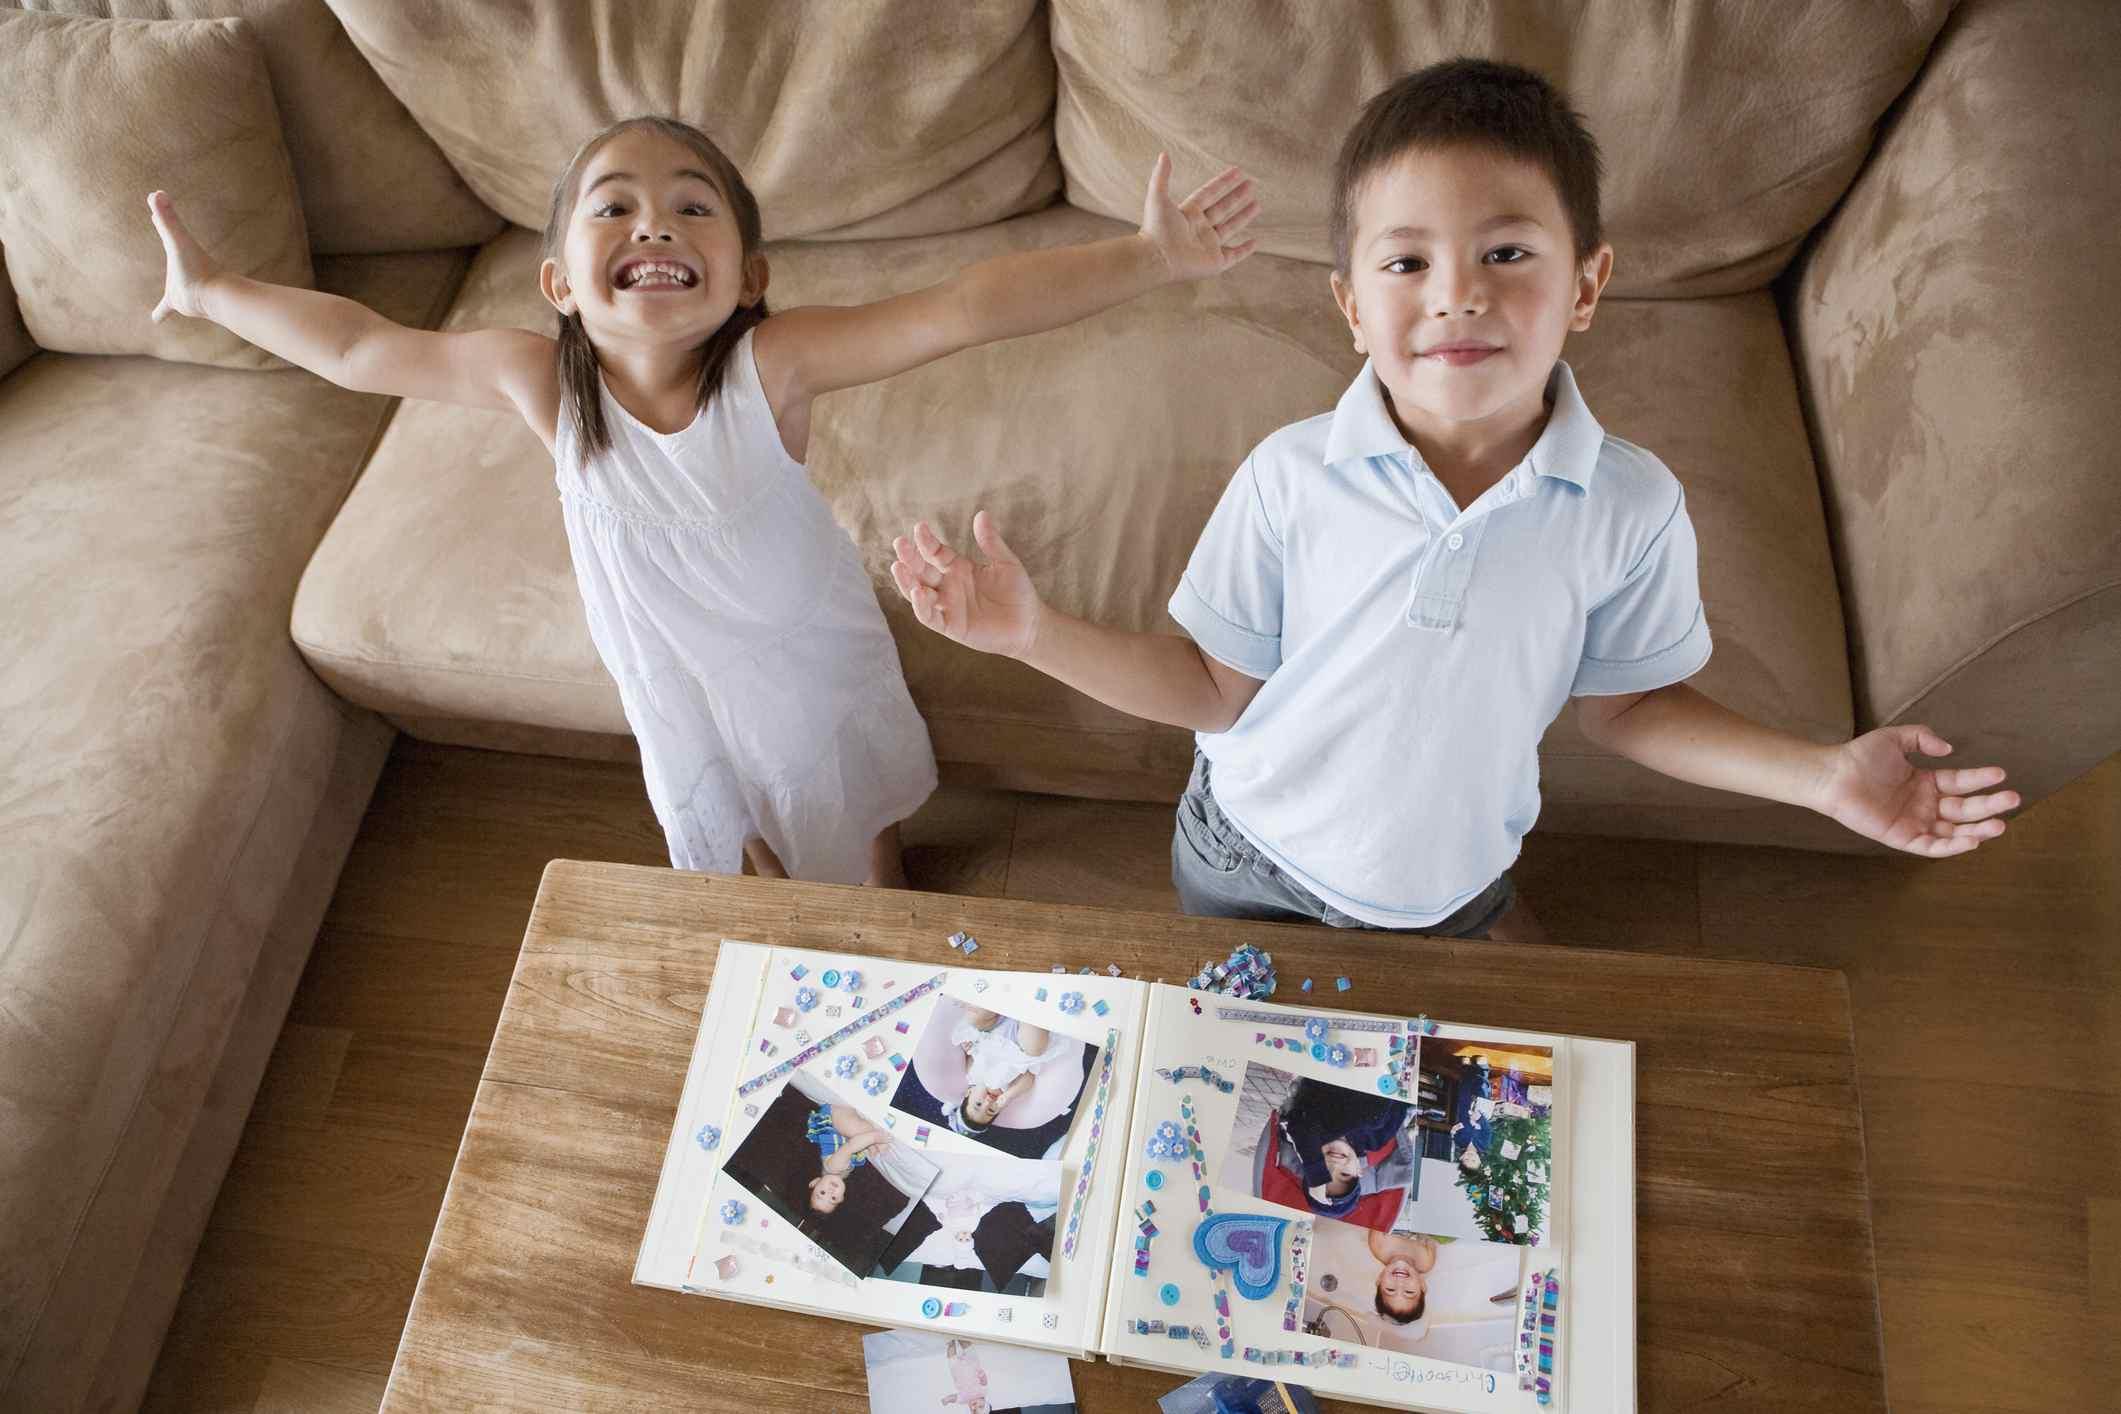 babysitting fun bag ideas